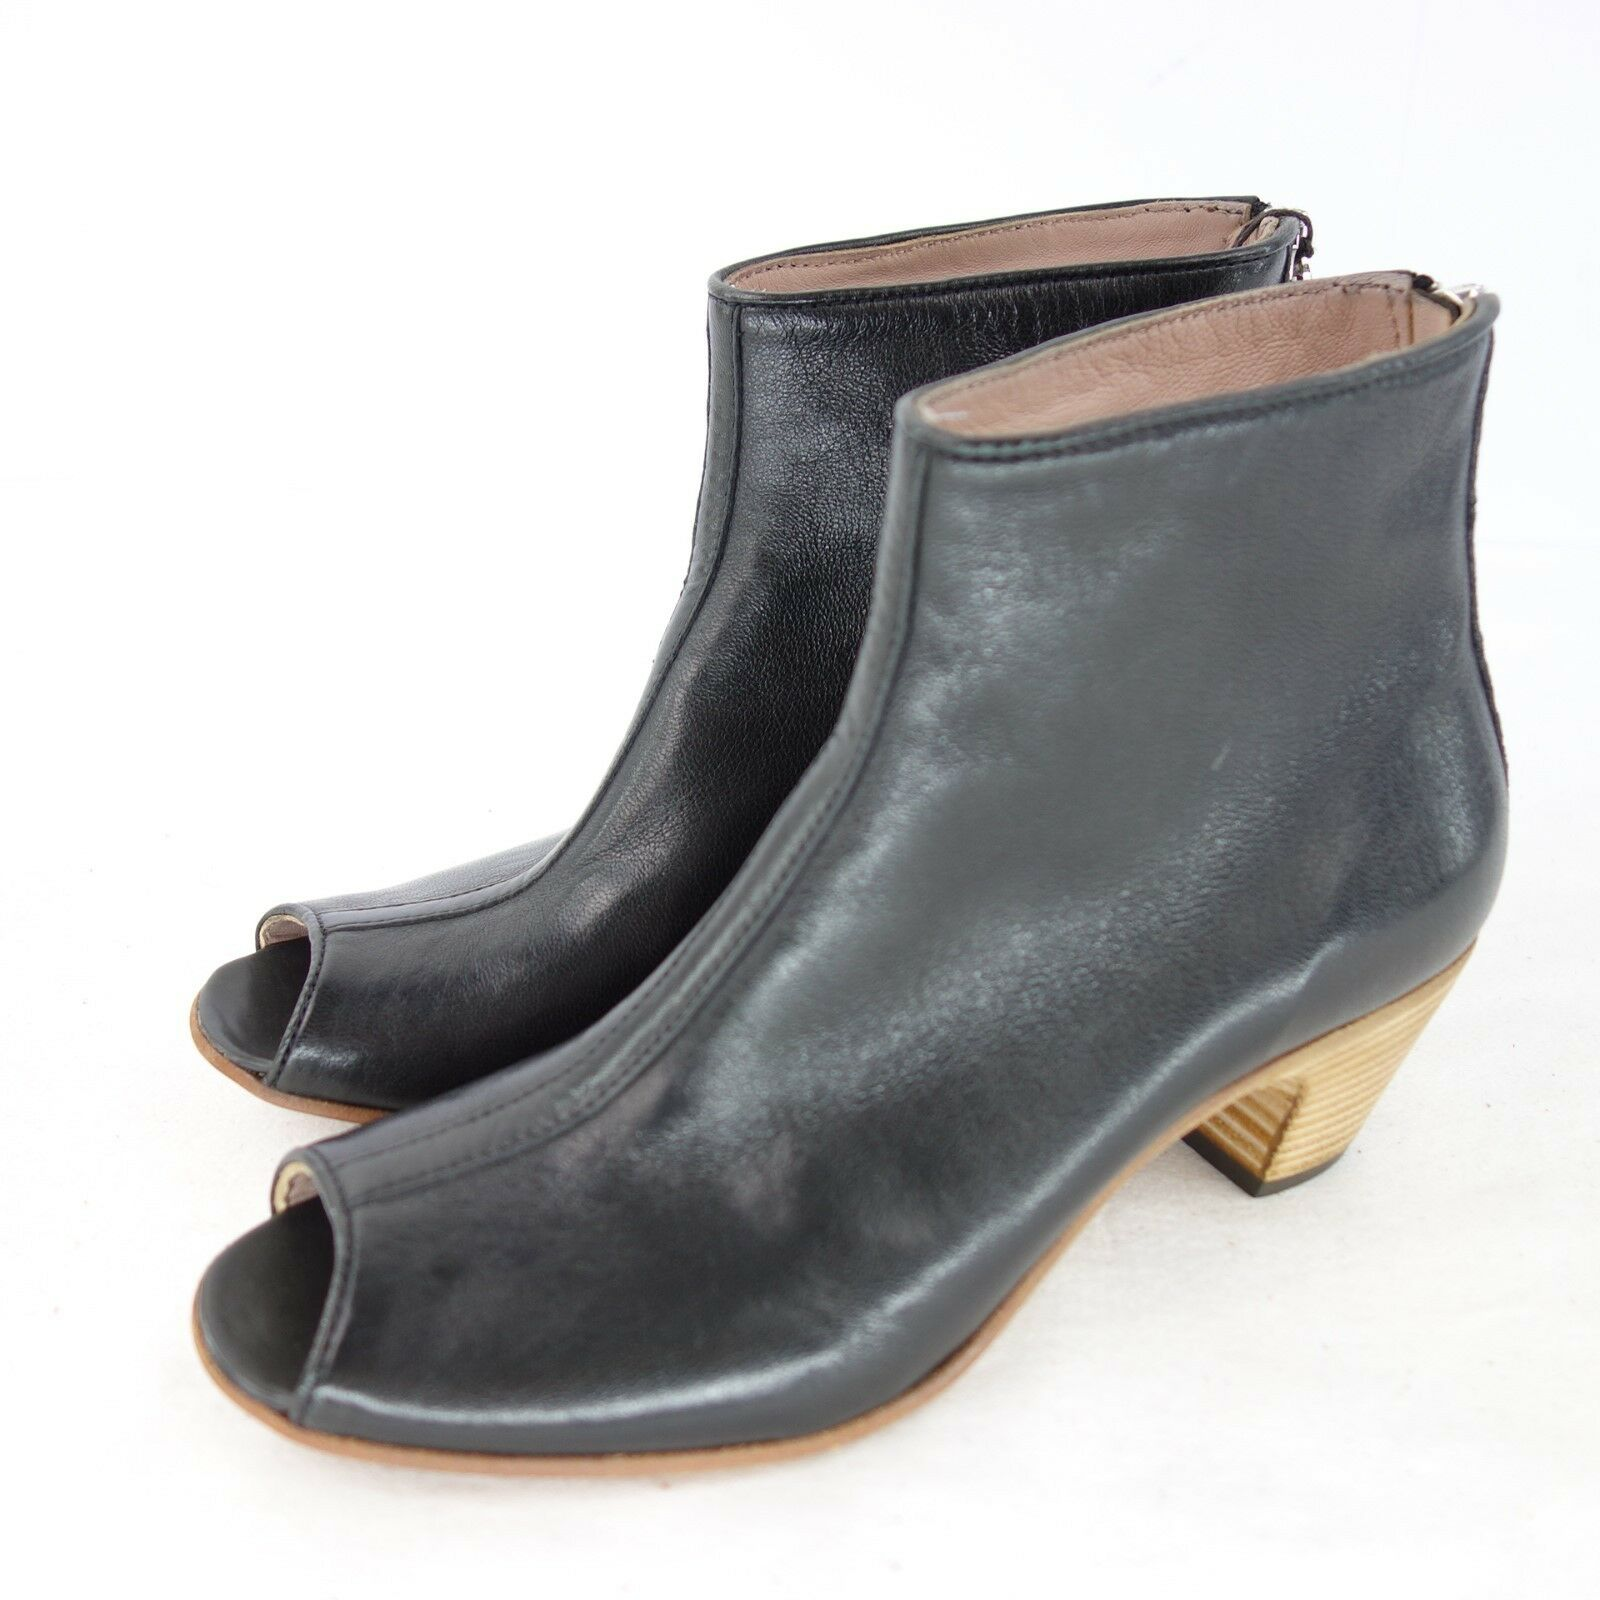 CORVBNI Damen Schuhe Bnkle Stiefeletten Stiefel Gr 37 Schwarz Leder NP 189 NEU